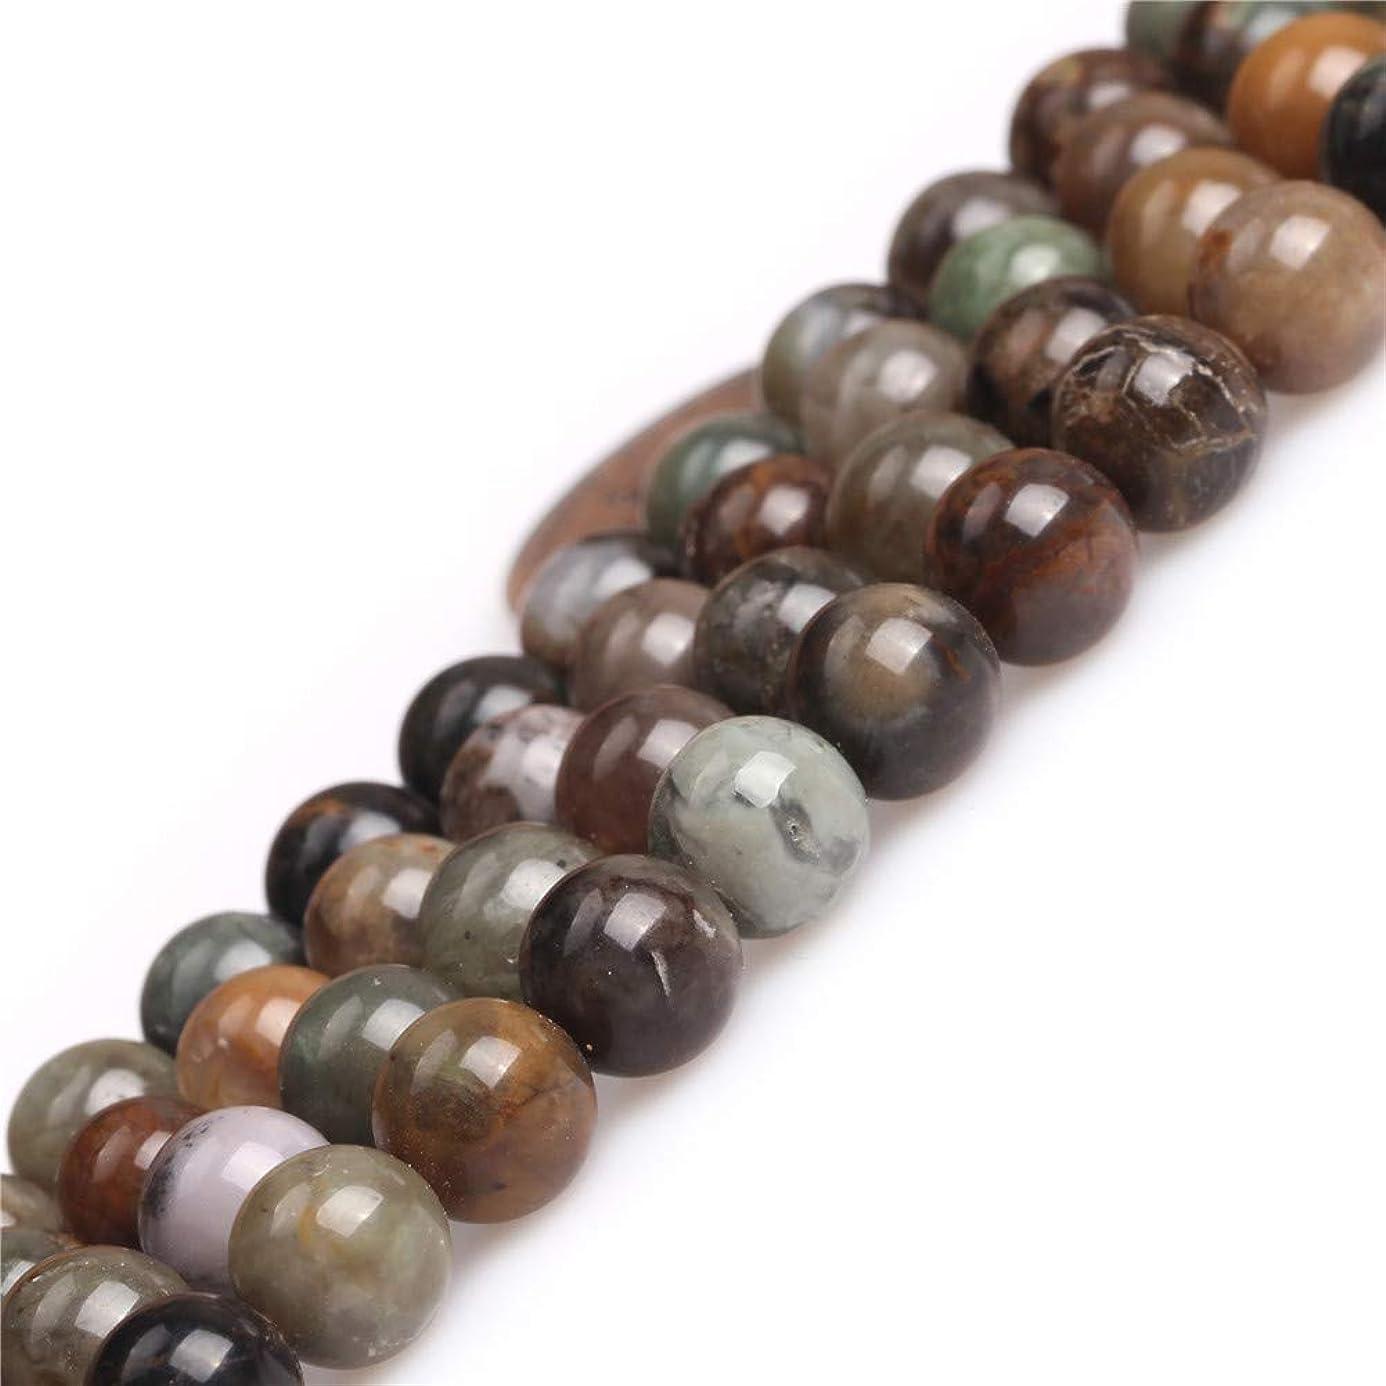 JOE FOREMAN Brown Ocean Jasper Agate Gemstone Beads for Jewrlry Making Strand 15